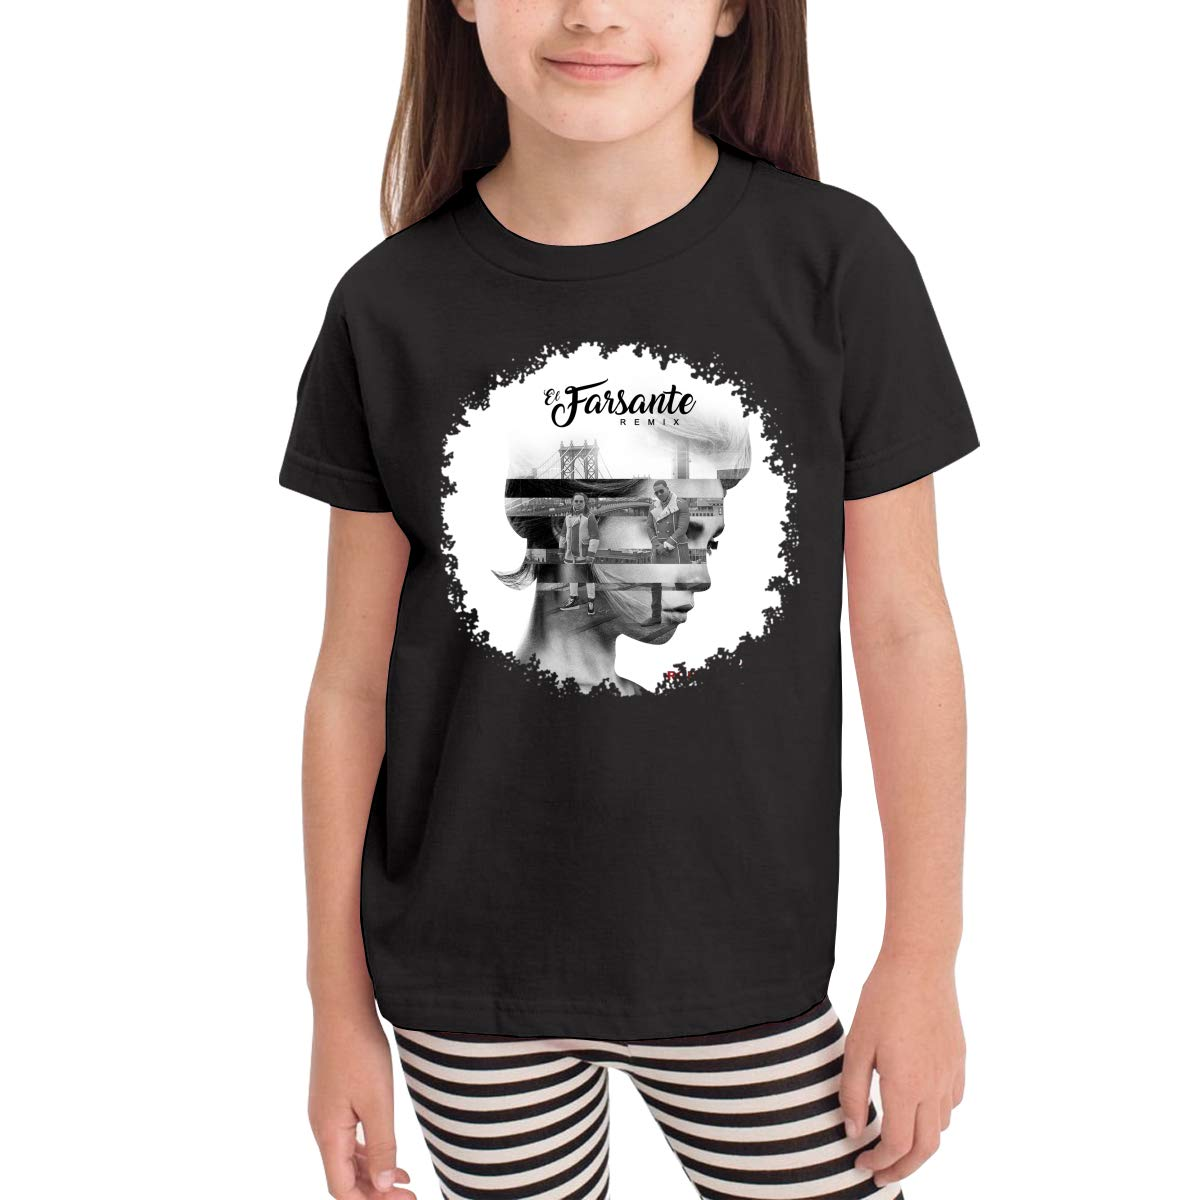 WYeter Ozuna El Farsante Boys Girls Kids Soft Short Sleeve Tshirt Black